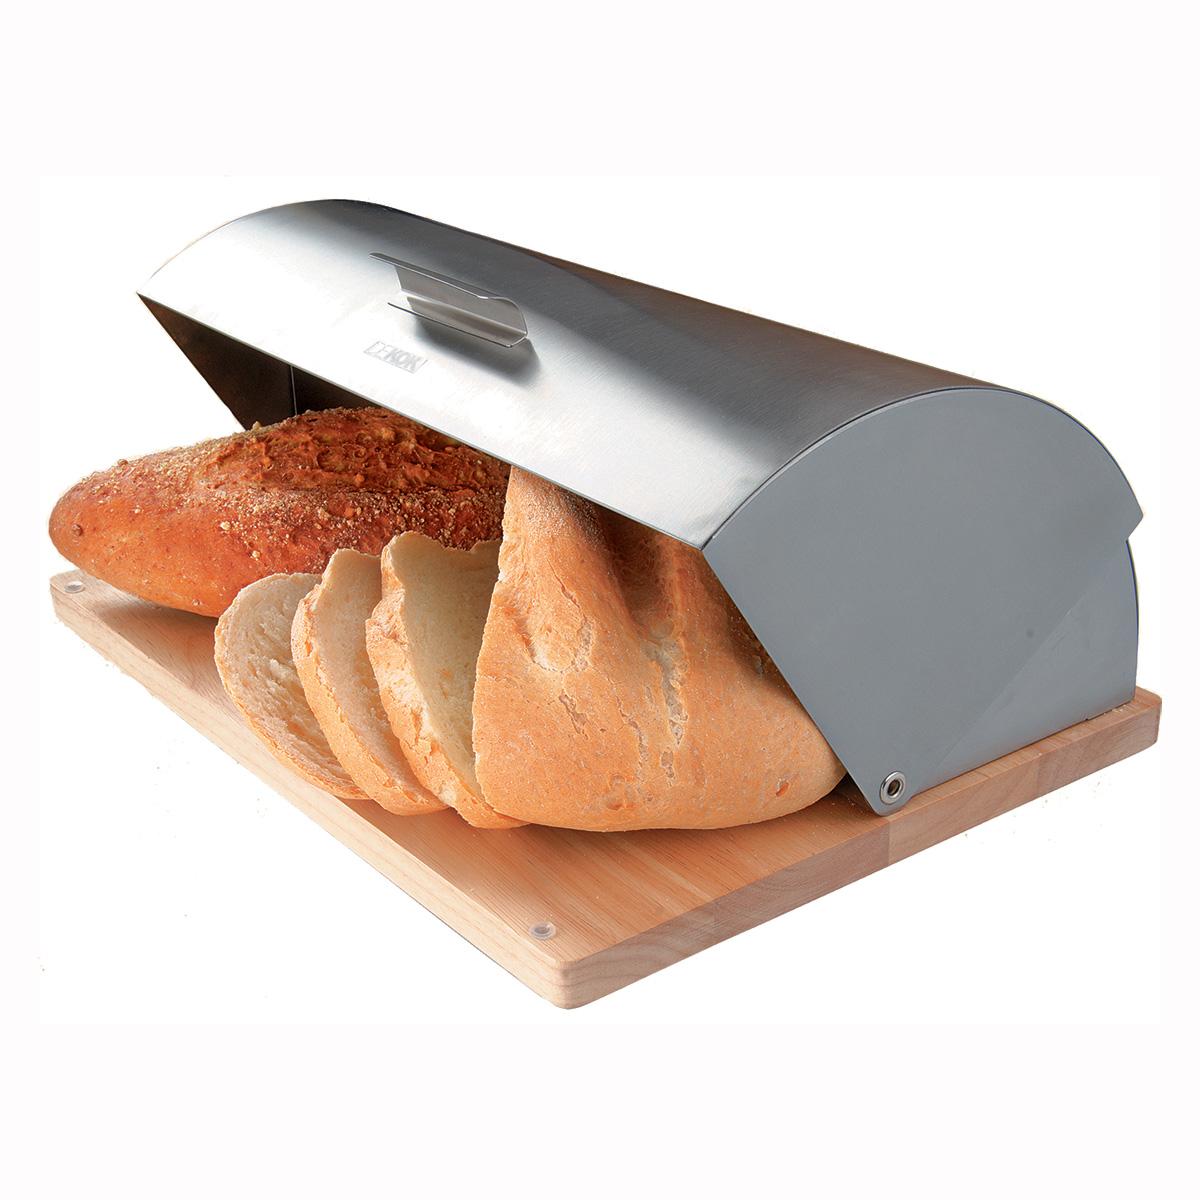 "Хлебница ""Dekok"", цвет: серый, бежевый"